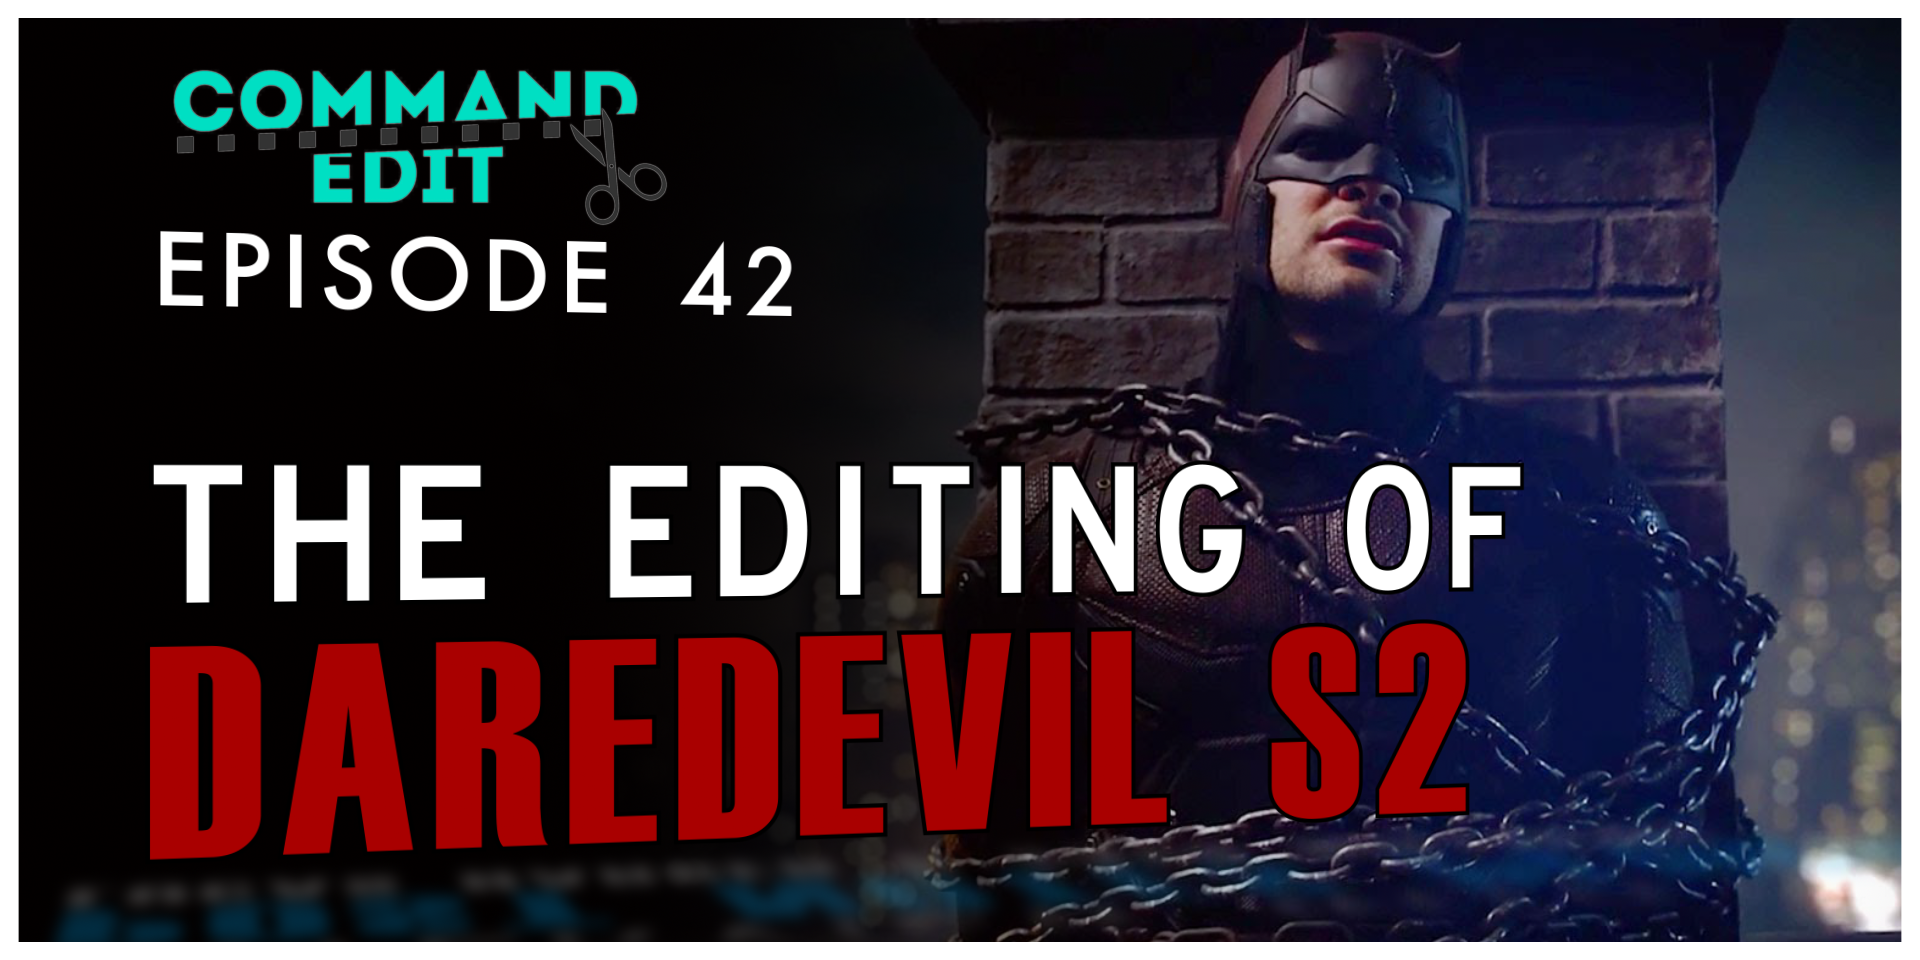 Episode 42 of Command Edit Podcast Editing of Daredevil Season 2